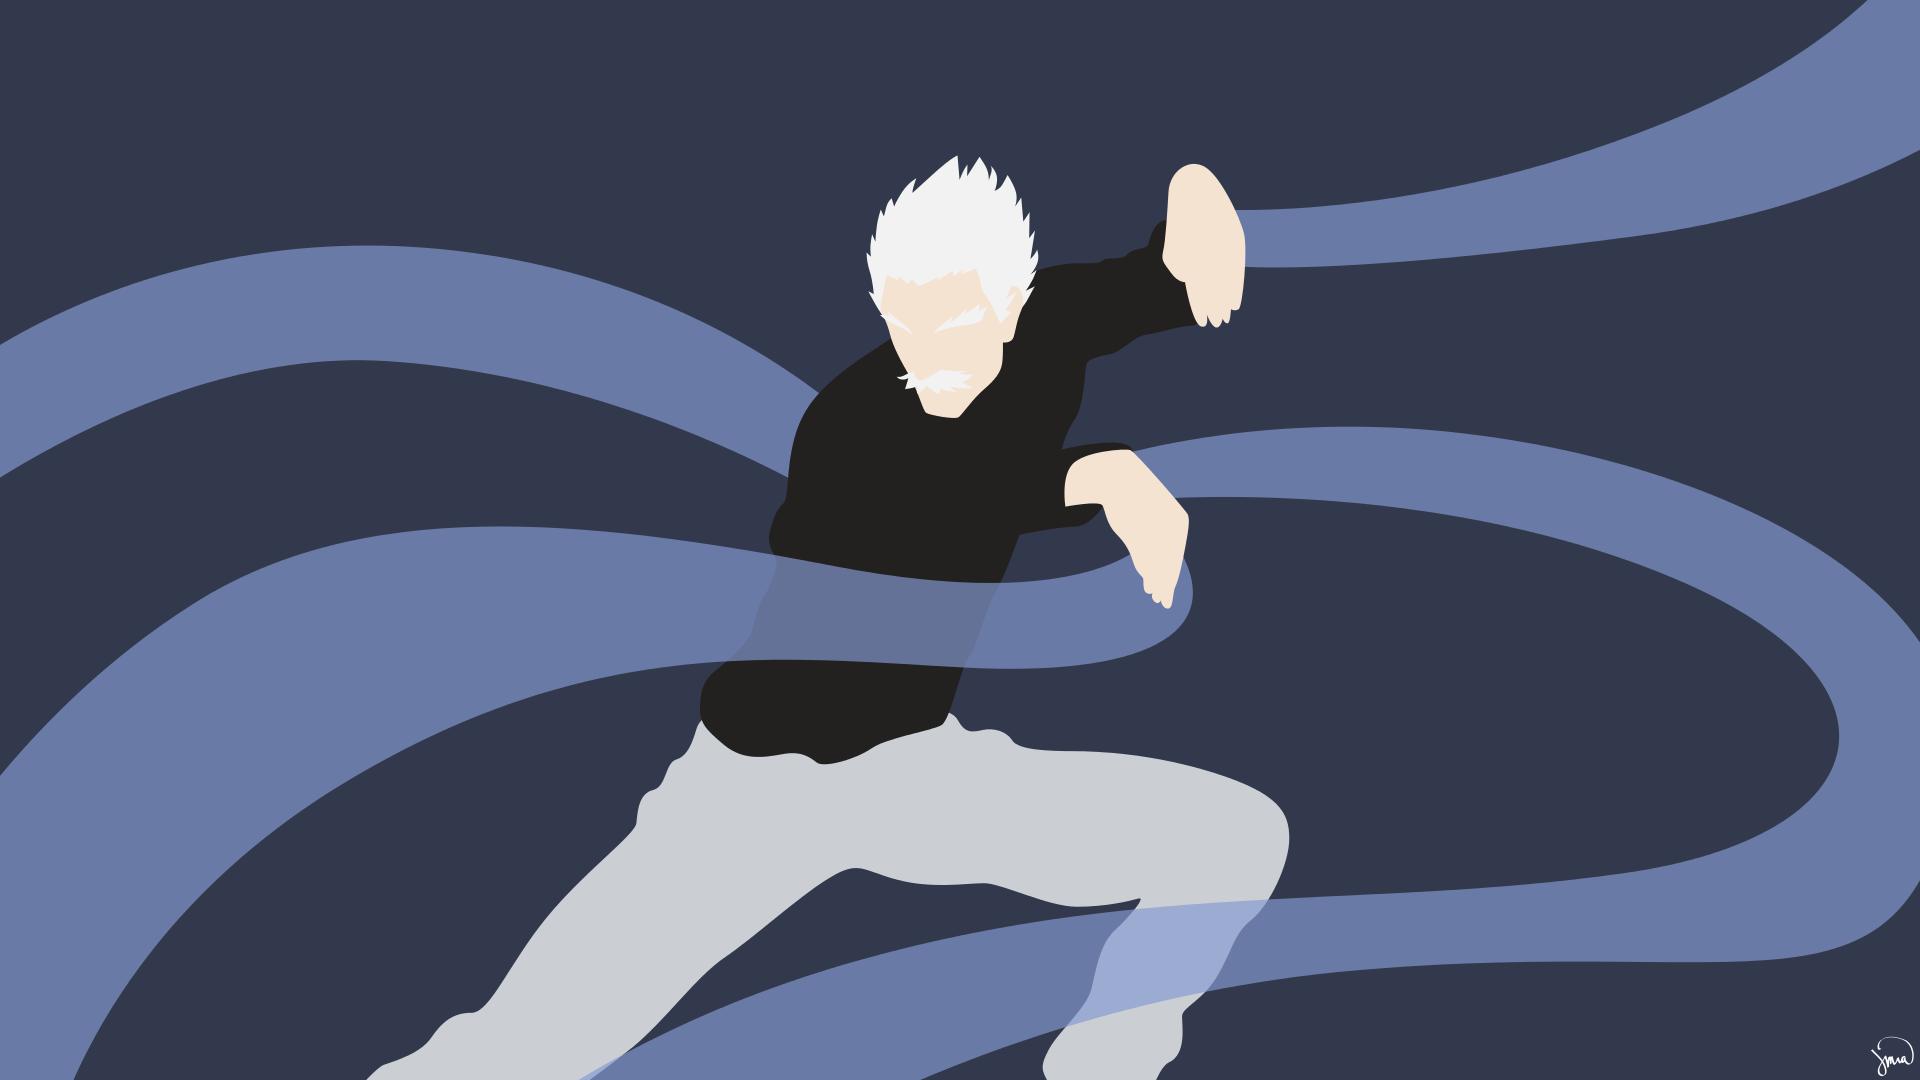 Free Photo Anime One Punch Man Yusuke Murata To Desktop